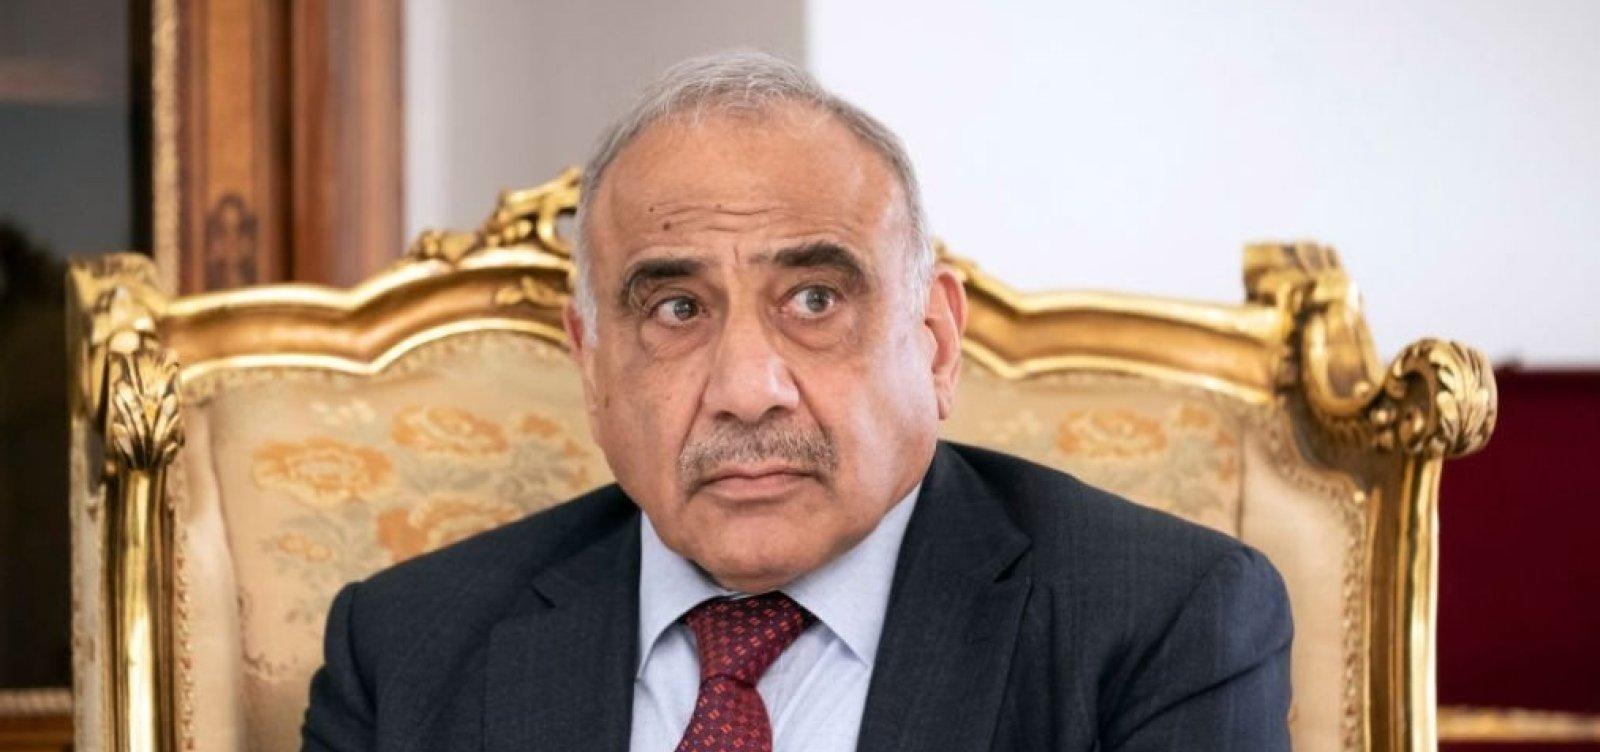 [Parlamento do Iraque aceita pedido de renúncia do primeiro-ministro]